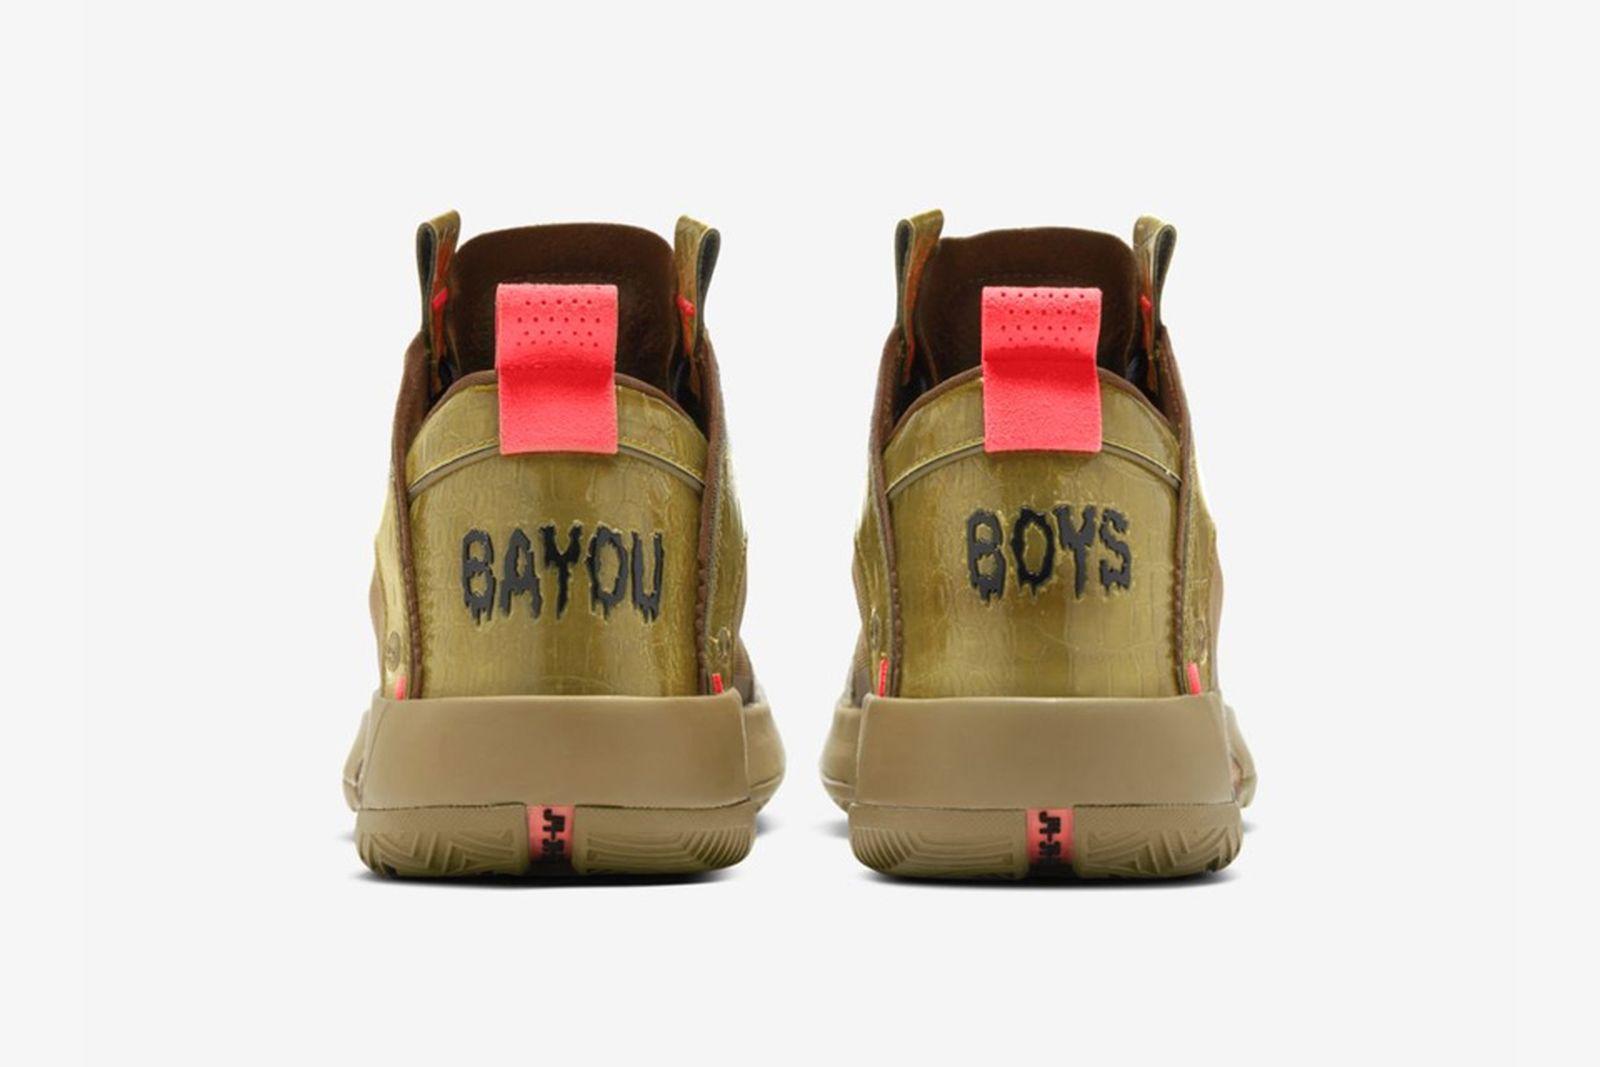 nike-air-jordan-34-bayou-boys-release-date-price-04